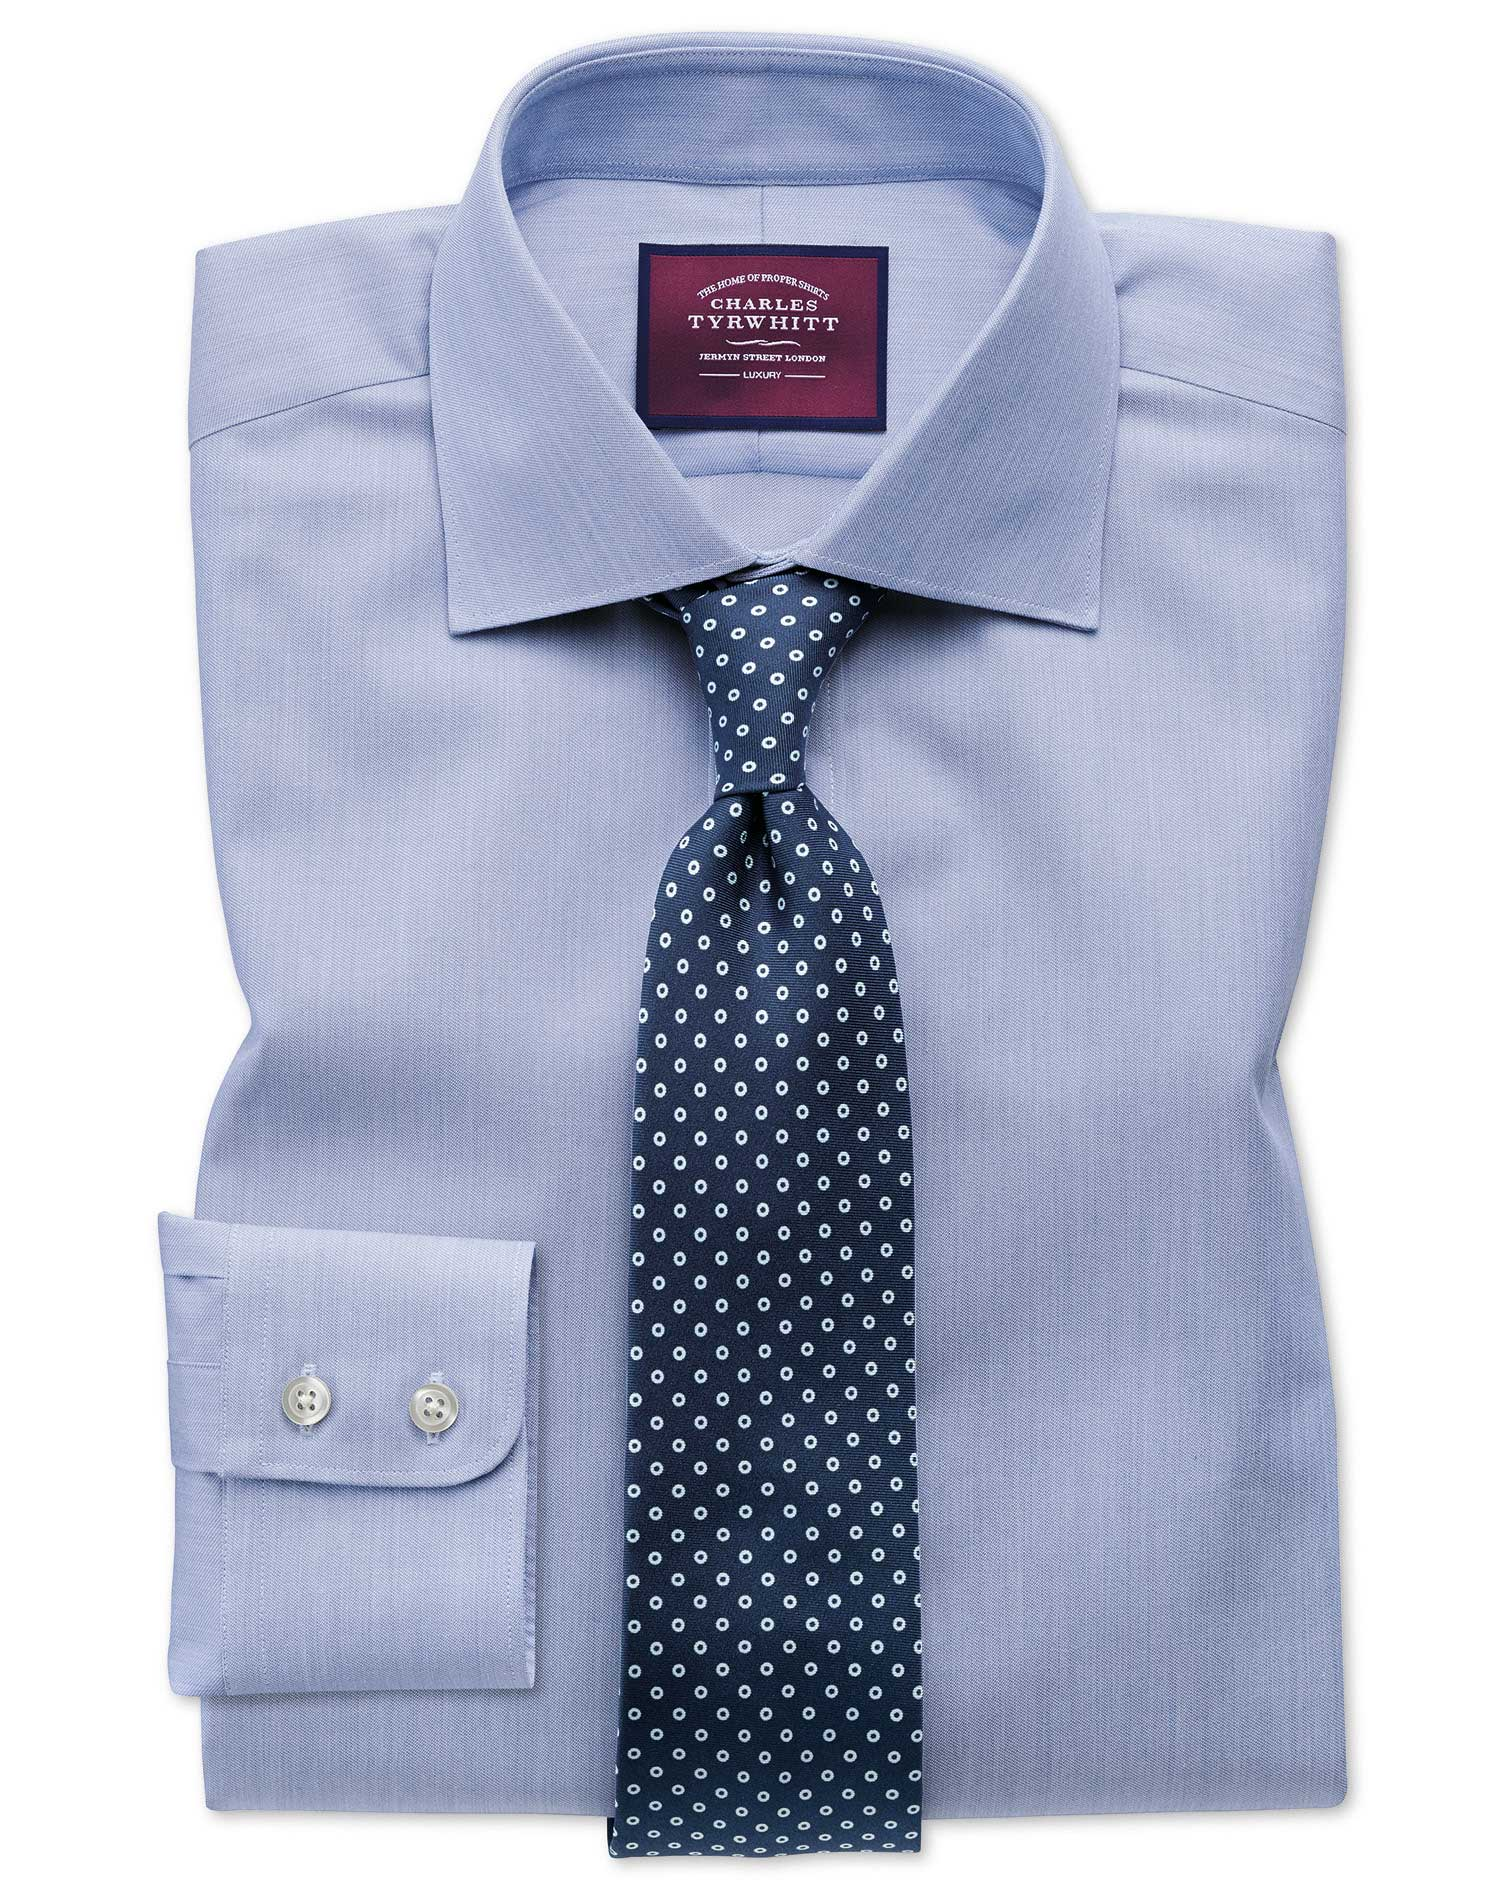 Classic Fit Semi-Cutaway Luxury Cotton Silk Blue Formal Shirt Single Cuff Size 15.5/35 by Charles Ty